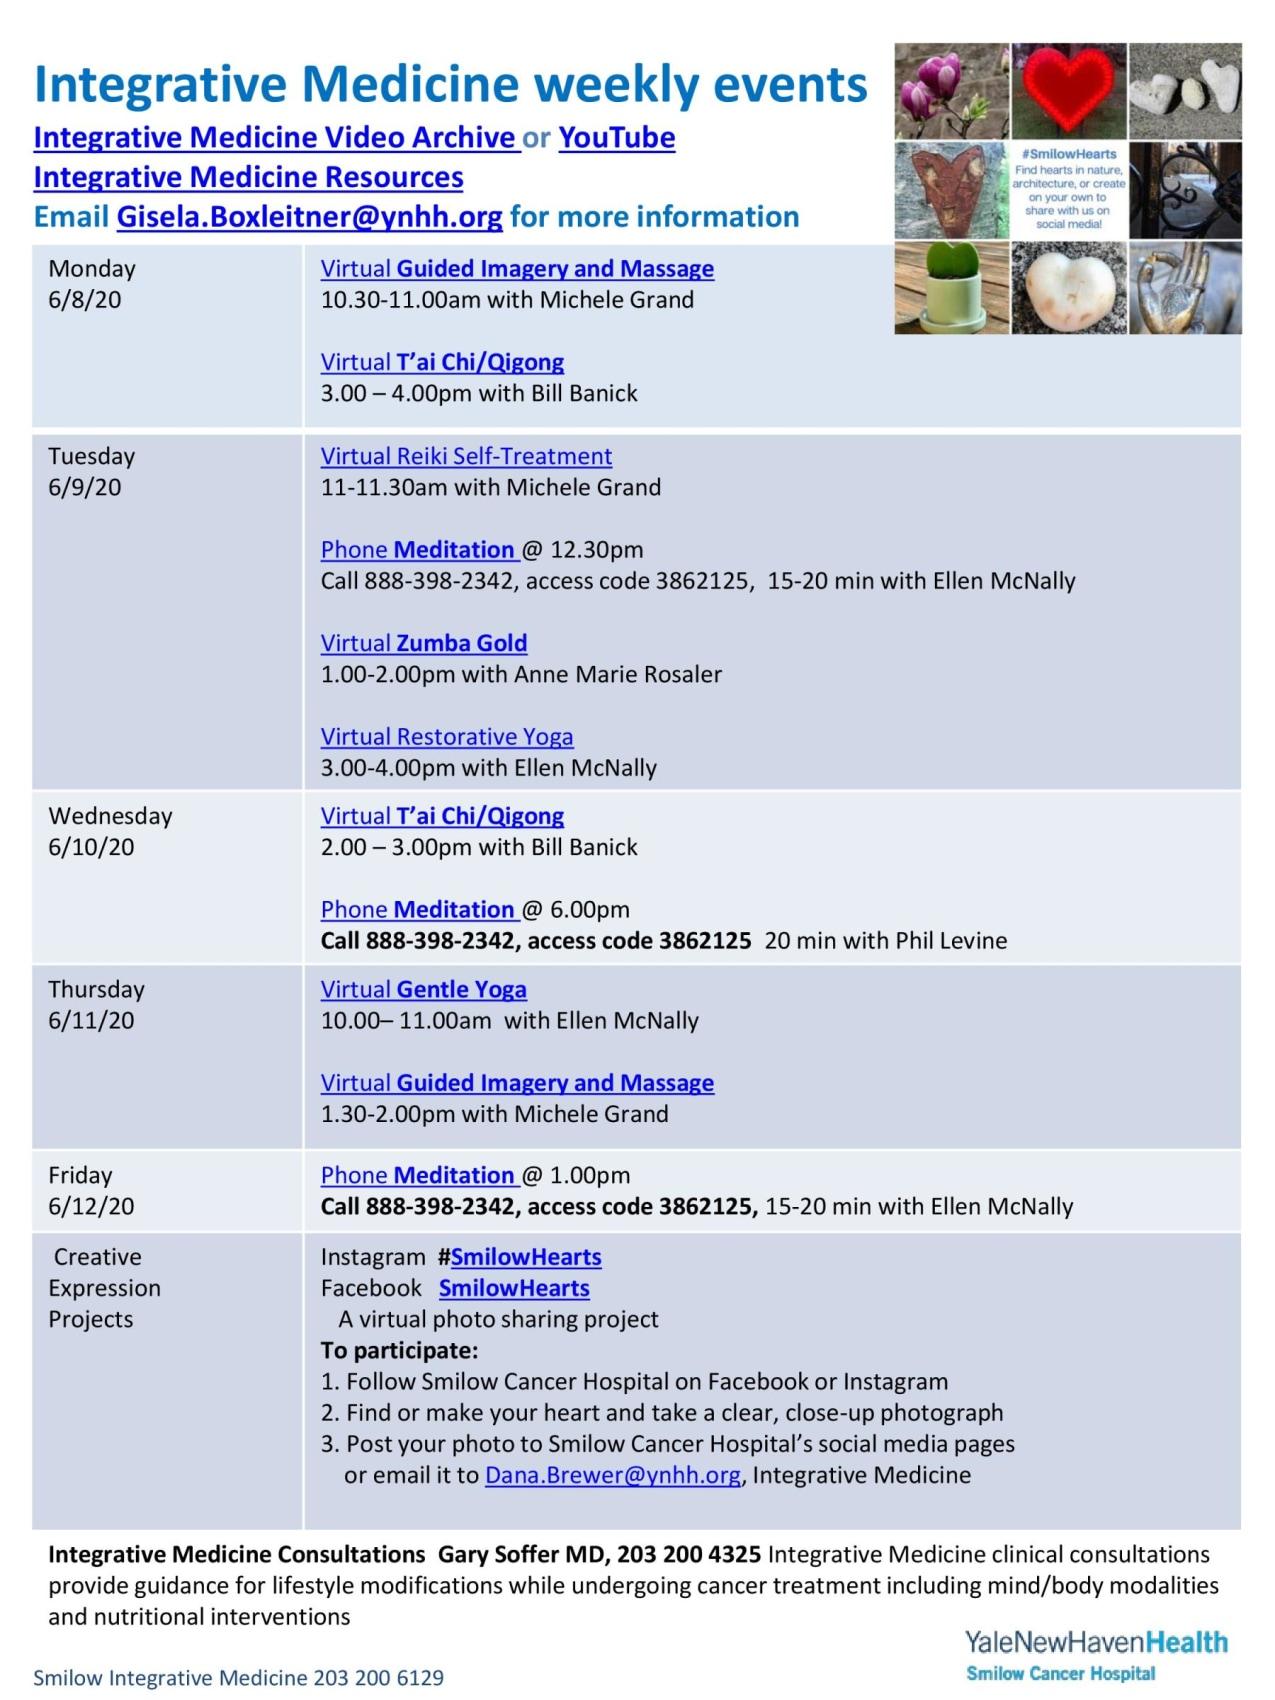 calendar of events for integrative medicine